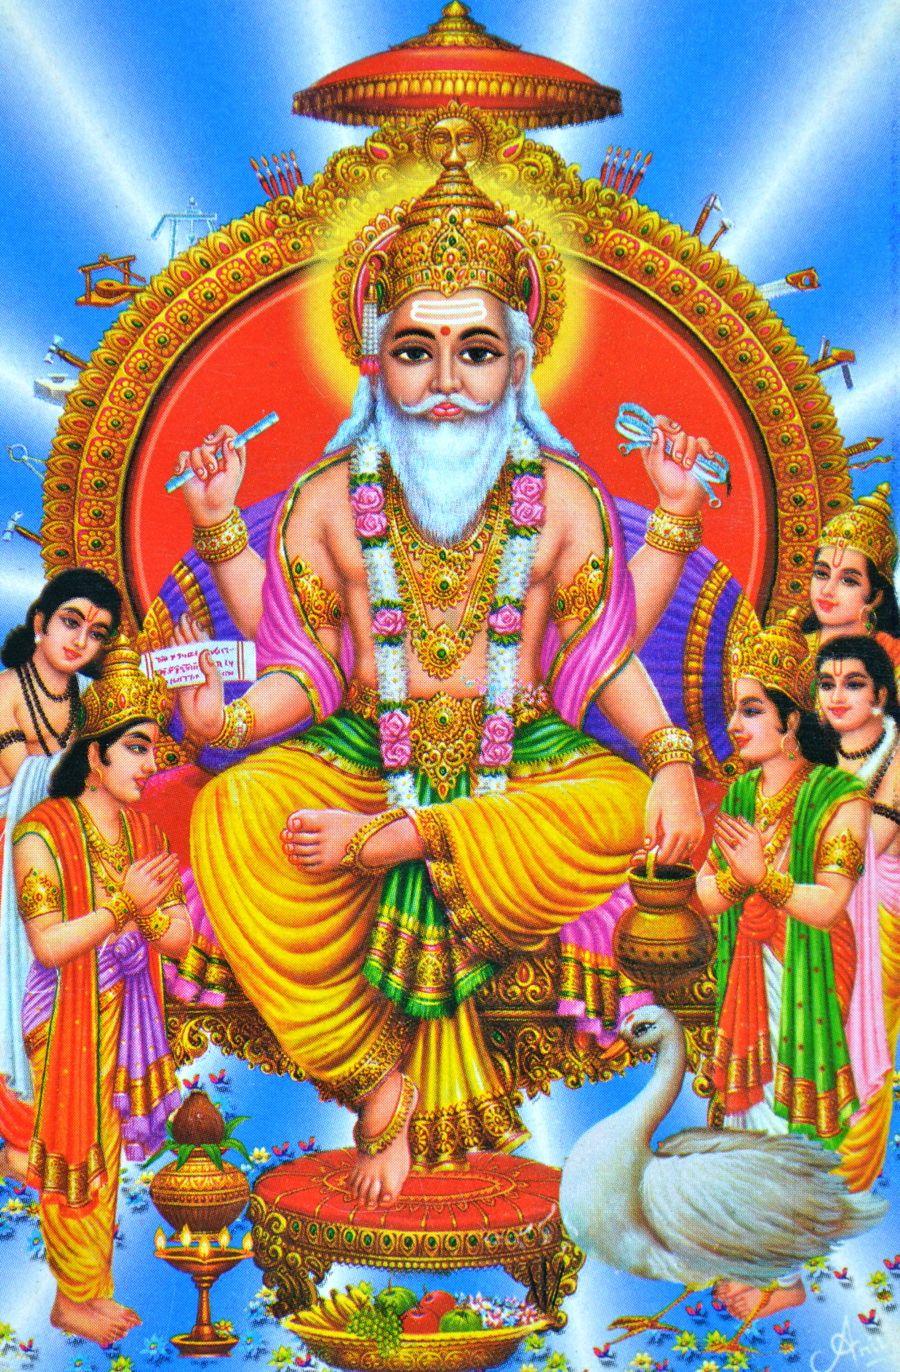 Hindu gods and goddesses gods goddesses gods goddesses rani mukerji god - Images of hindu gods and goddesses ...